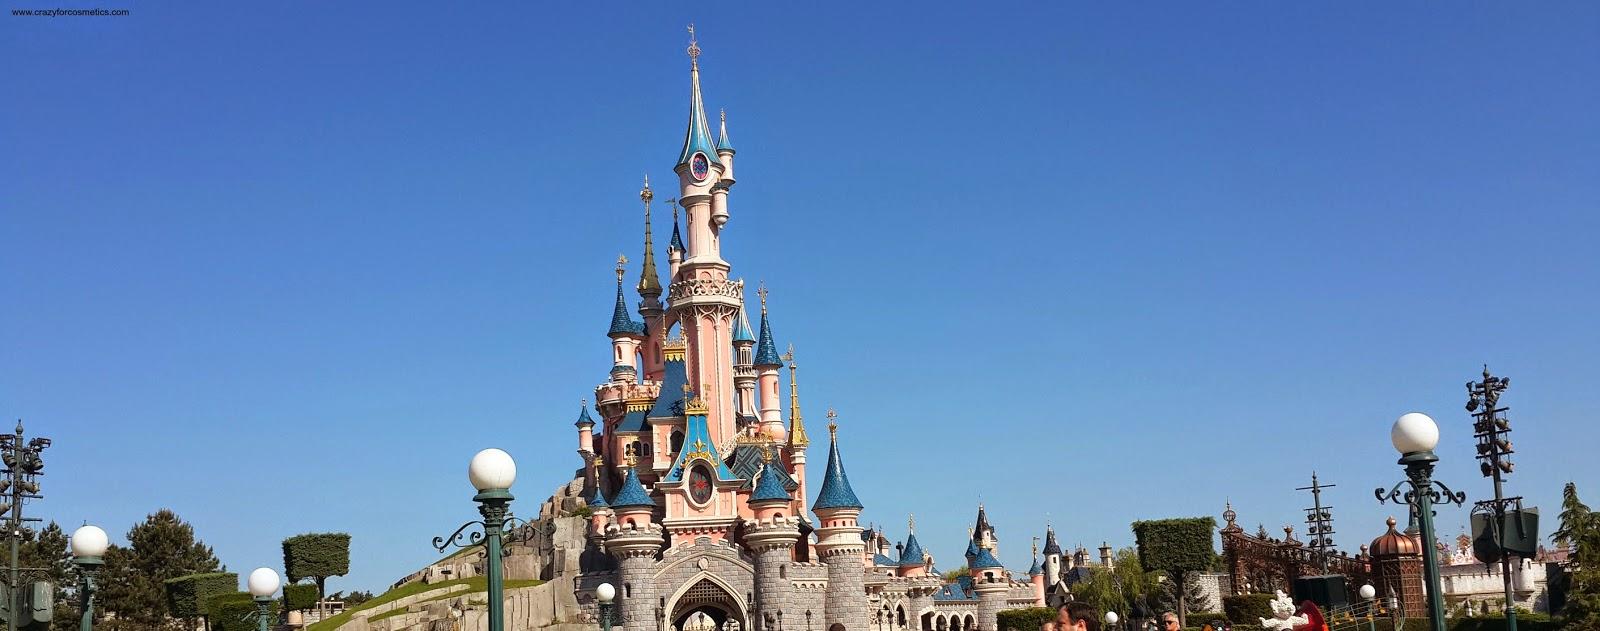 Europe Tour Itinerary -Europe Trip- Trip to Paris & Switzerland - Palace of Versailles- Hint Hunt Paris- Eiffel Tower Paris- Disneyland Paris